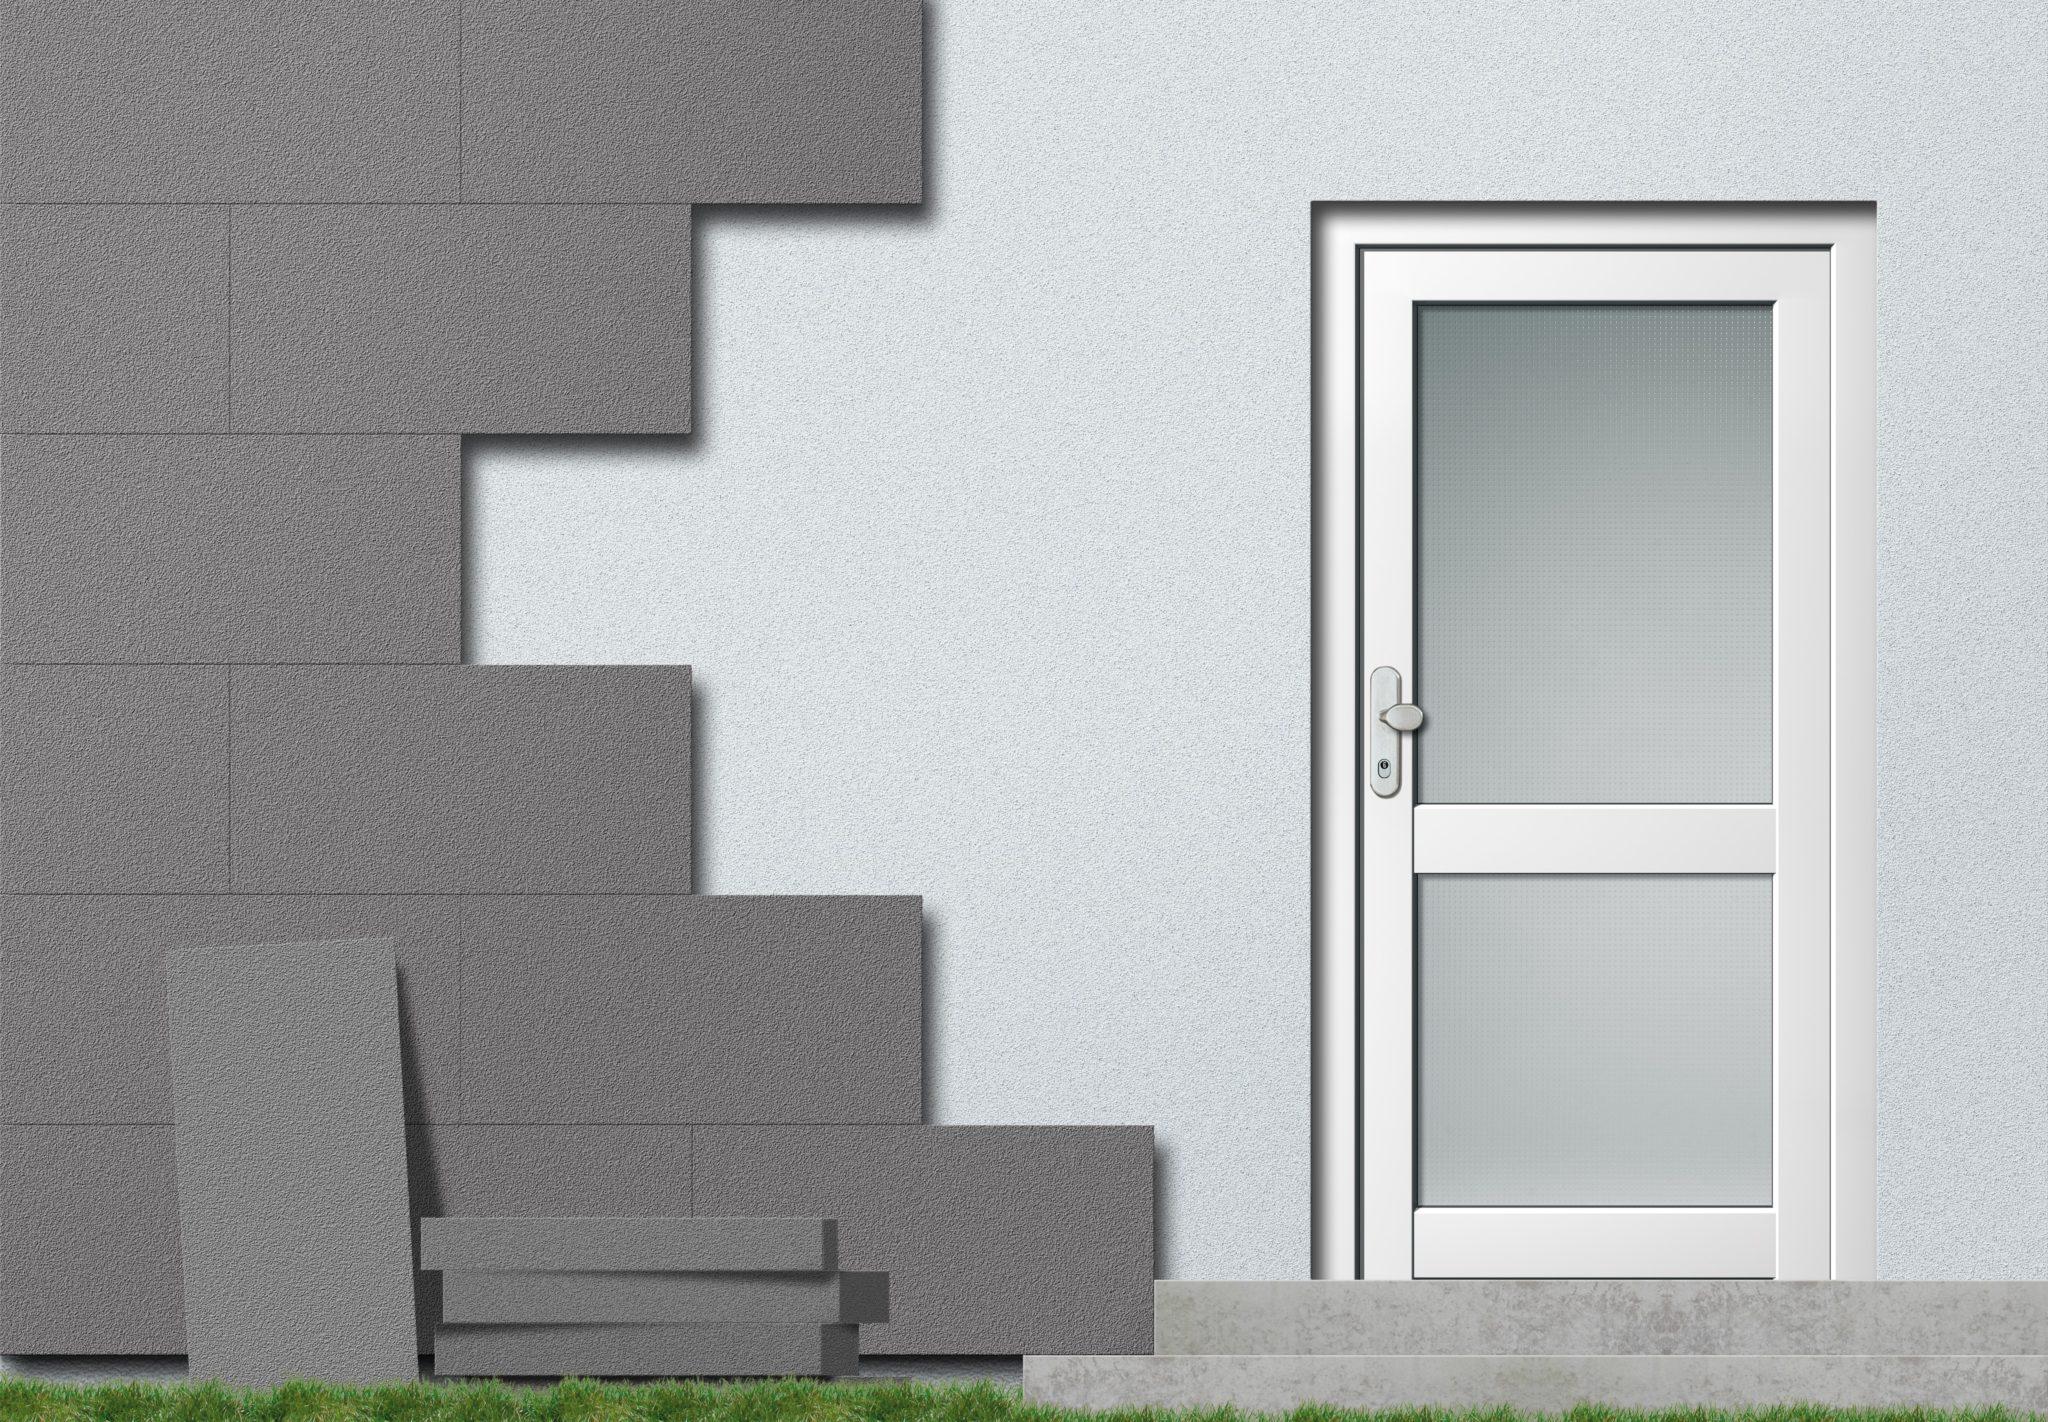 budowa domu. Black Bedroom Furniture Sets. Home Design Ideas